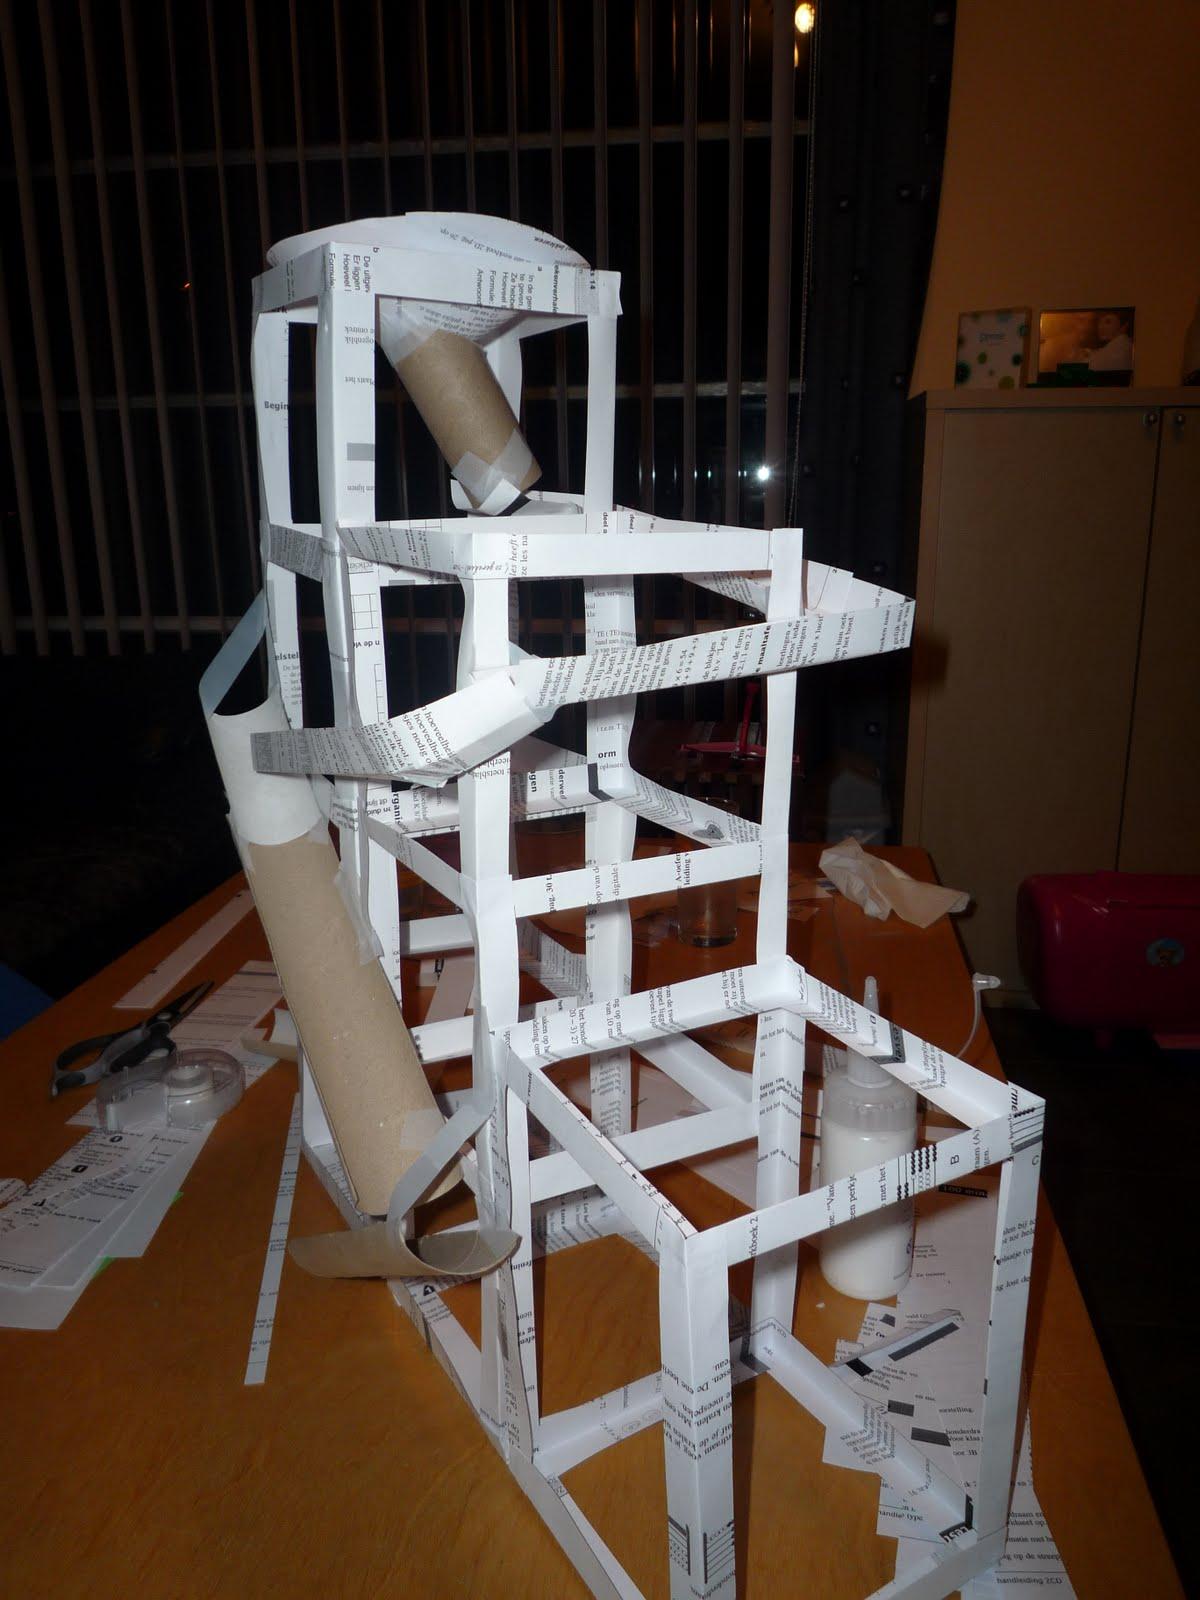 WO - Anya: Techniek: knikkerbaan maken